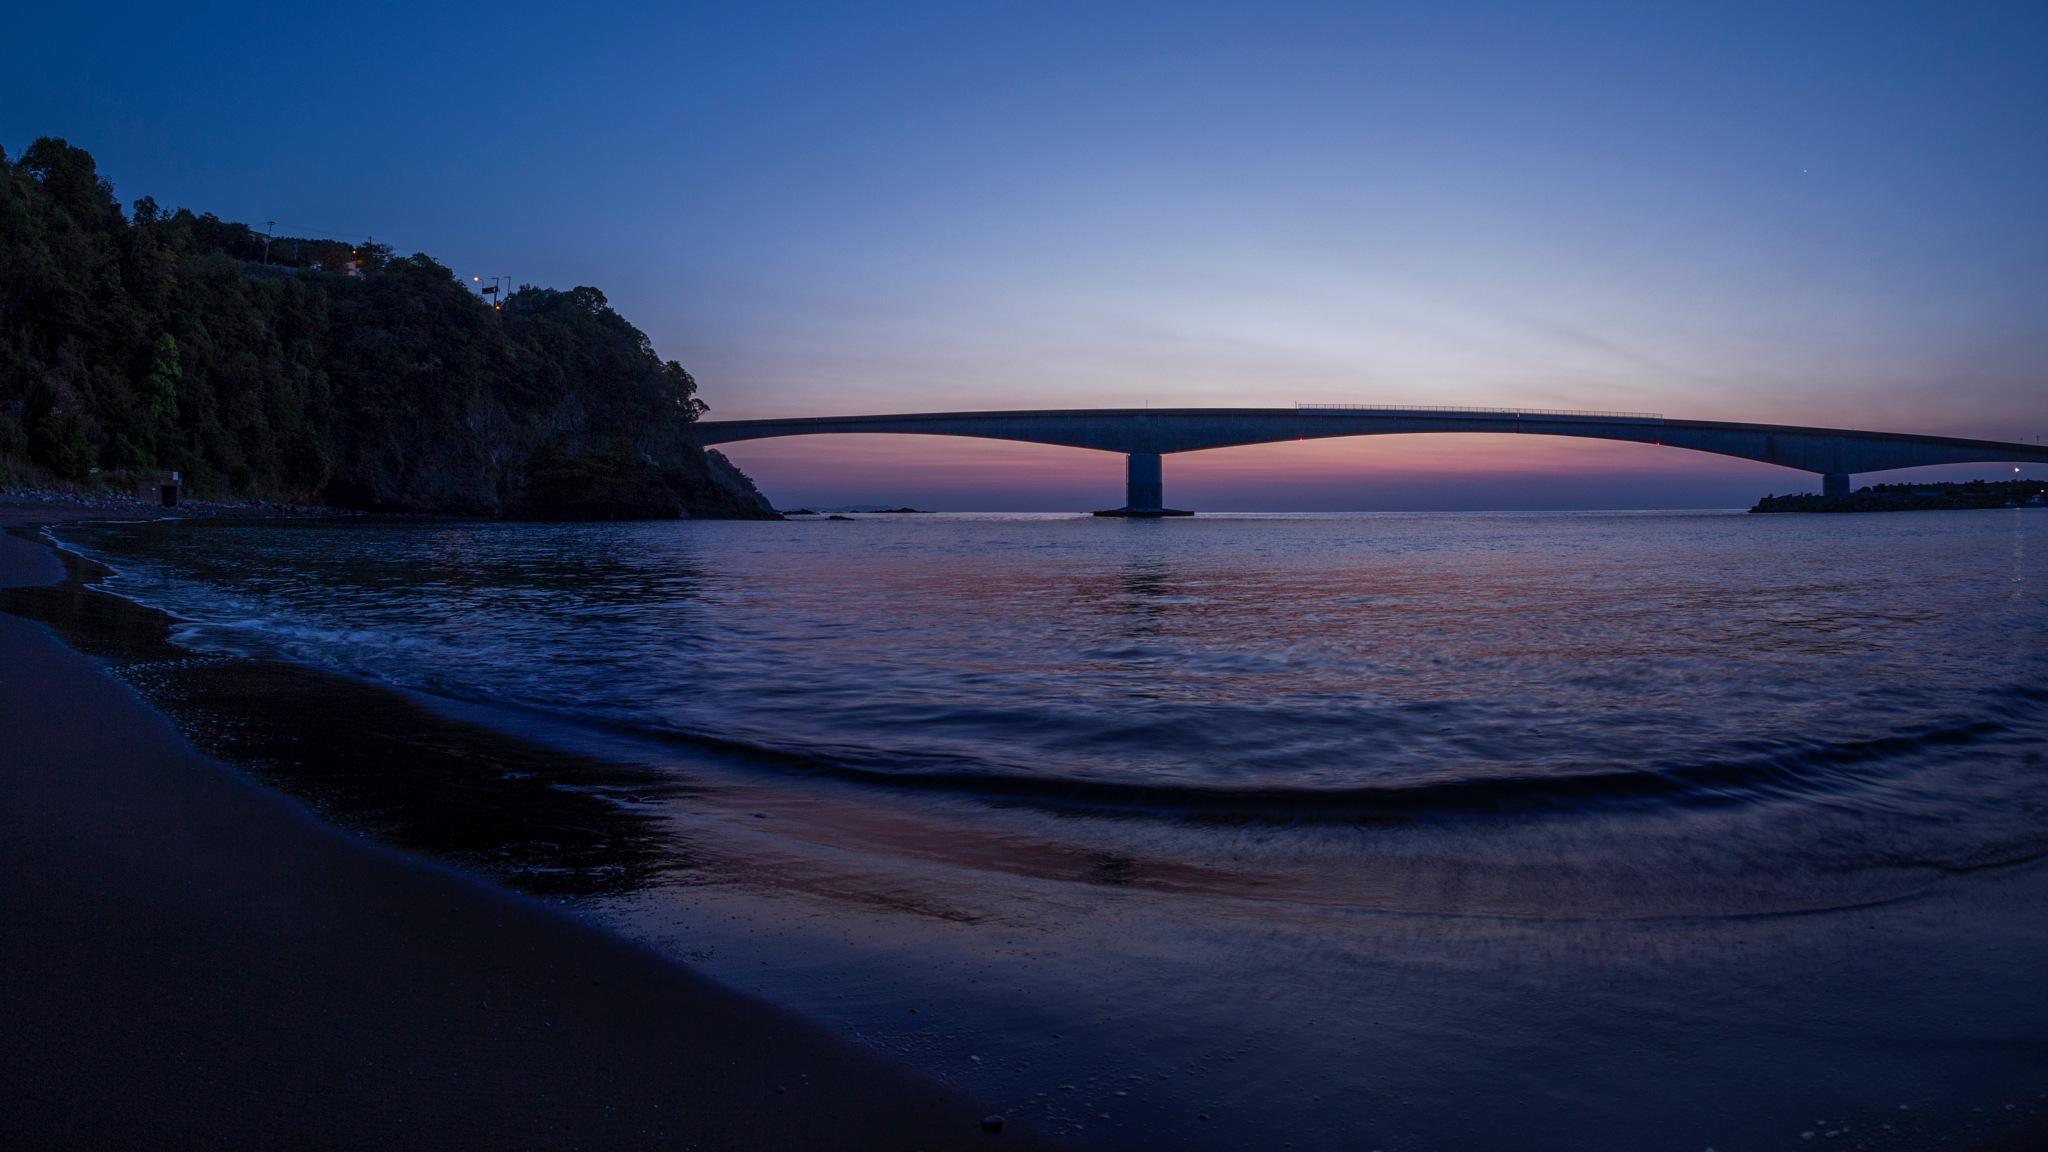 Early morning by Motohisa Shimazu